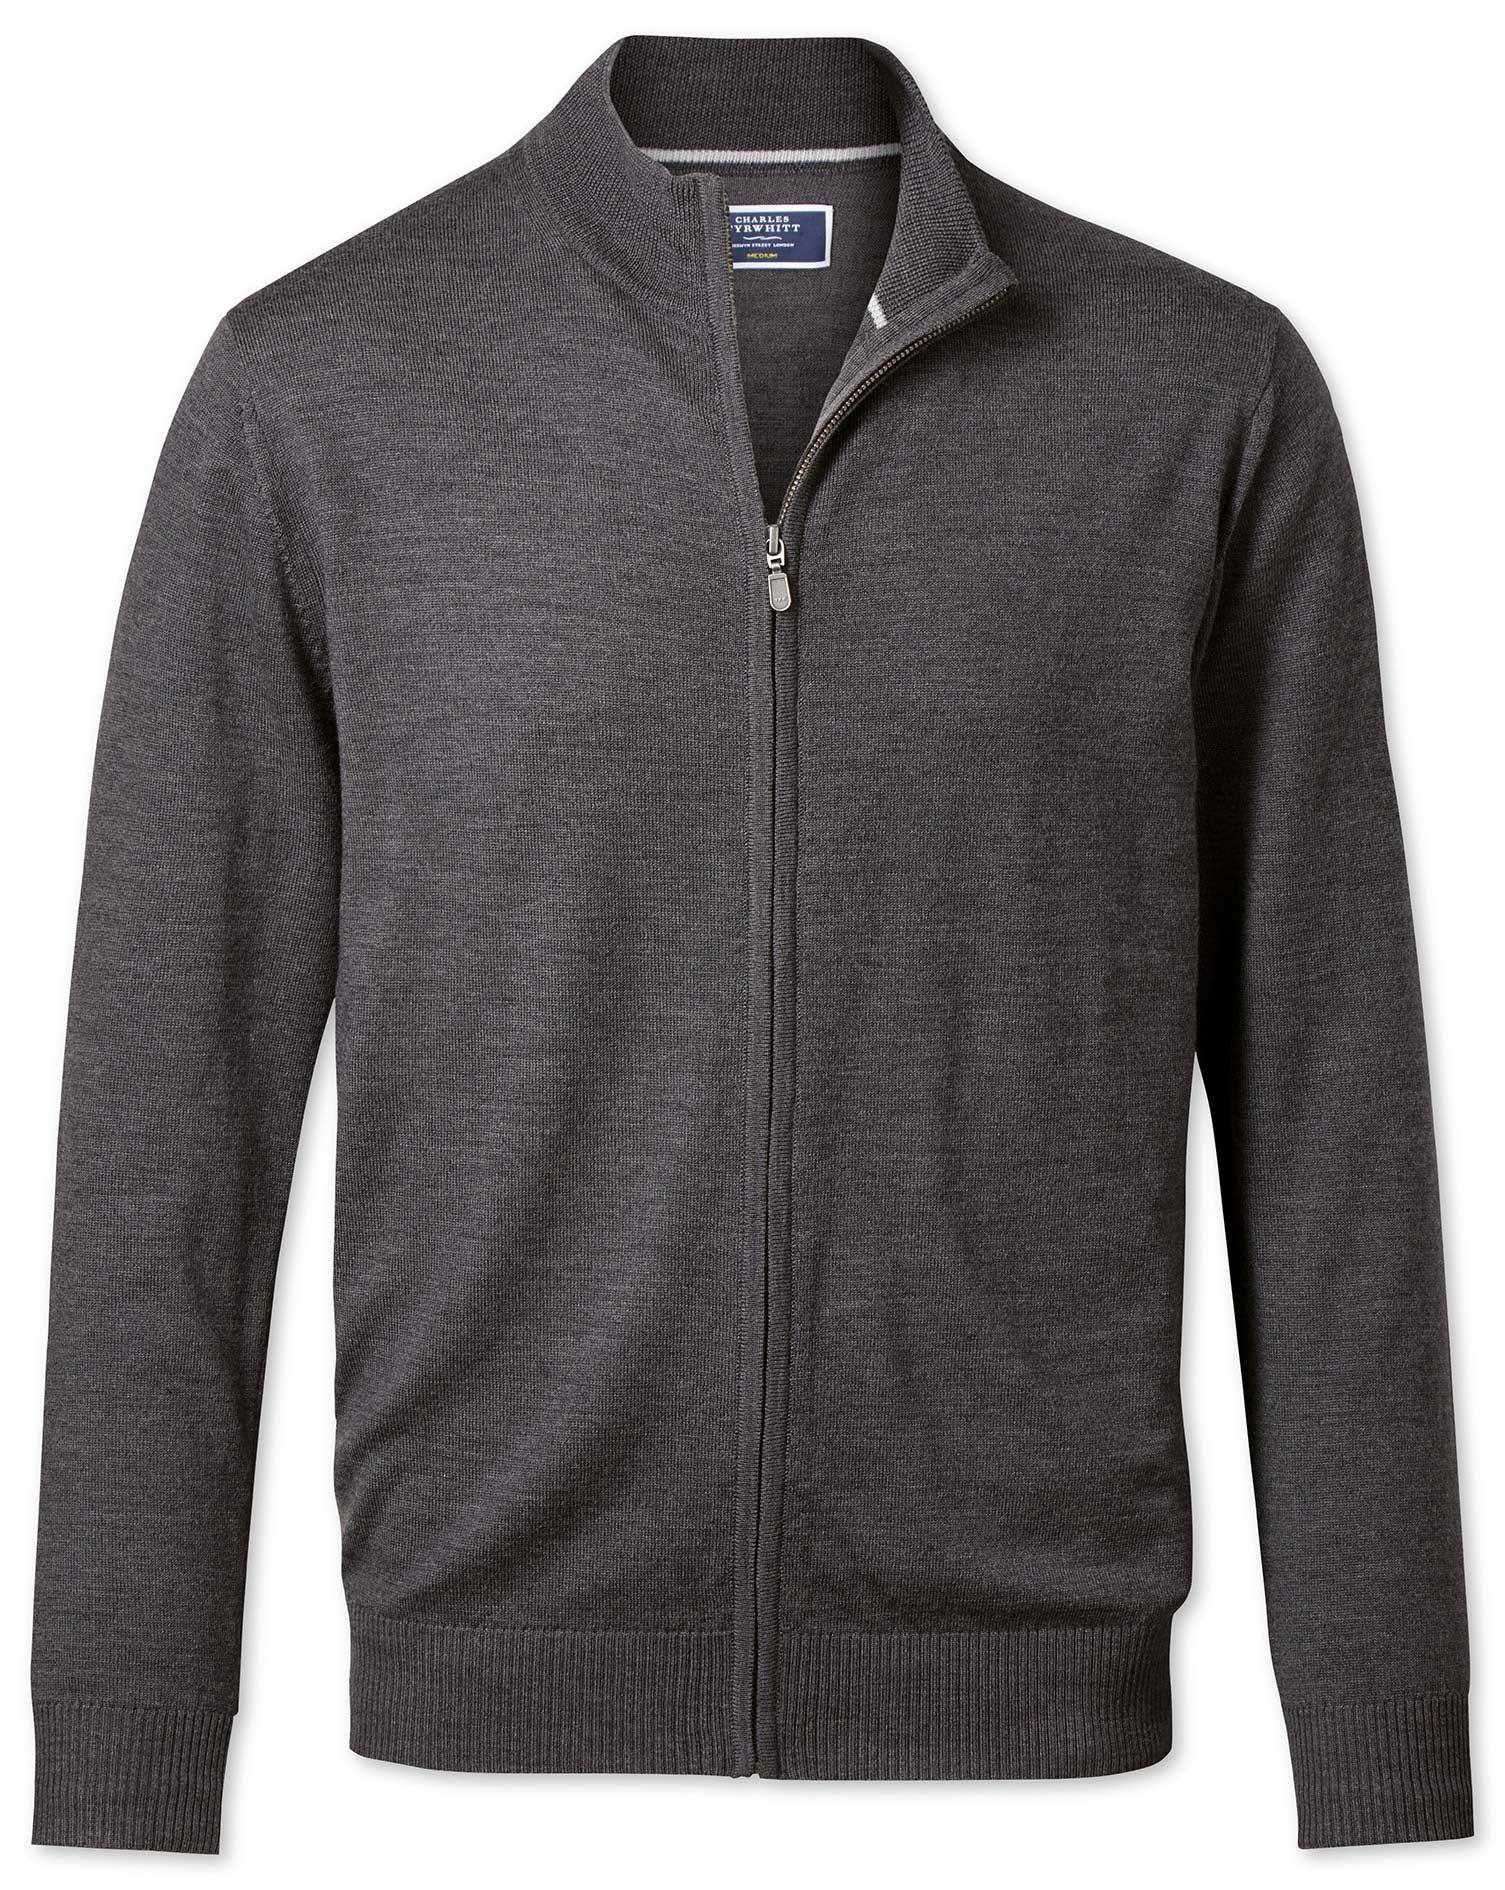 Charcoal Merino Wool Zip Through Cardigan Size XXXL by Charles Tyrwhitt